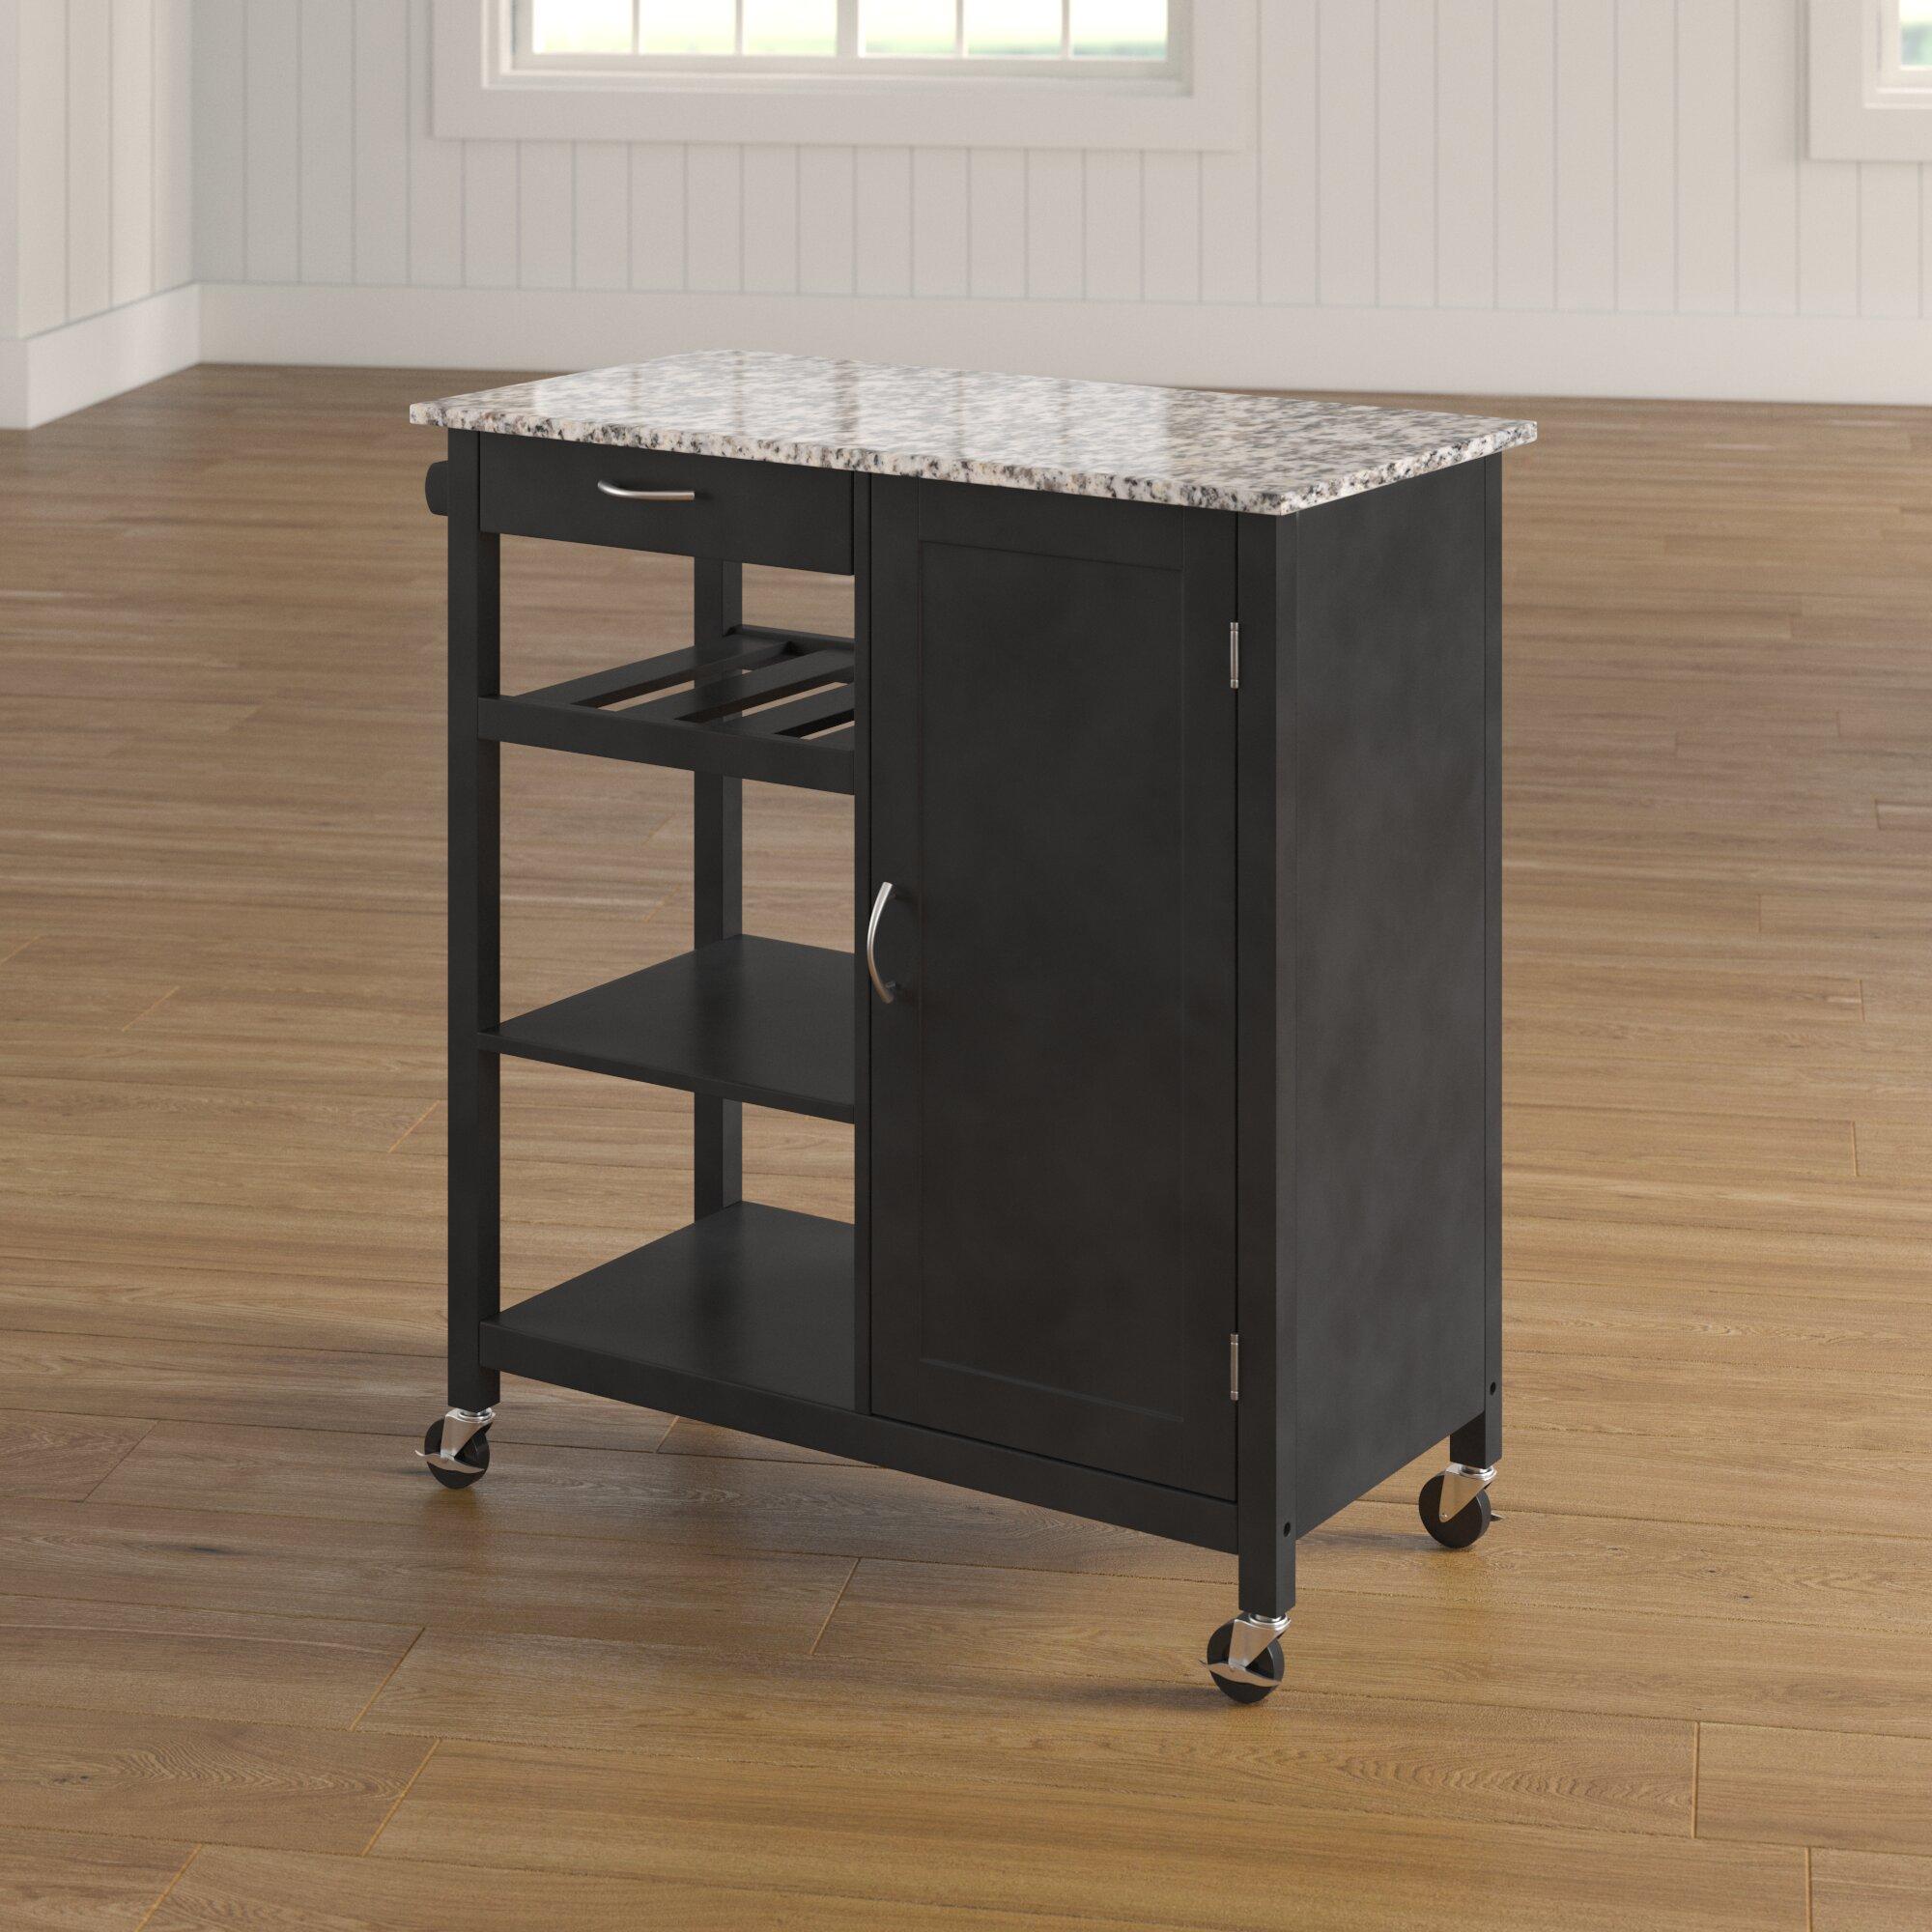 Red Barrel Studio Auden Kitchen Cart With Faux Marble Top Reviews Wayfair